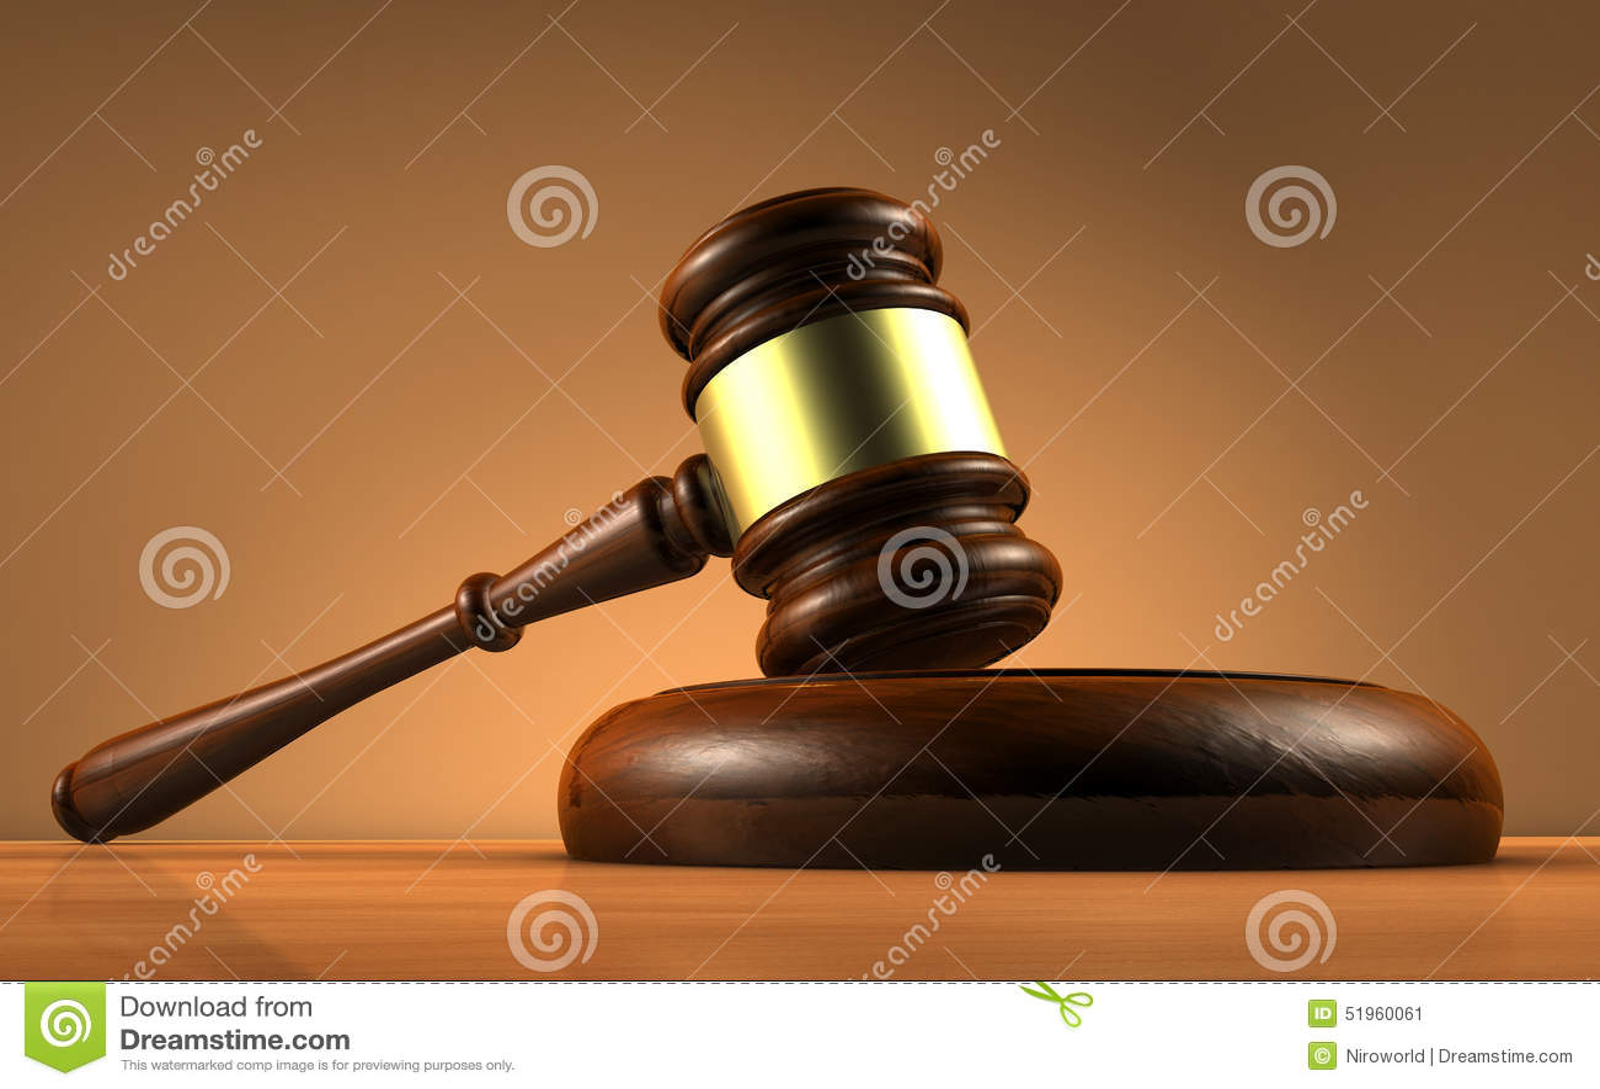 Símbolo de Law And Justice do juiz